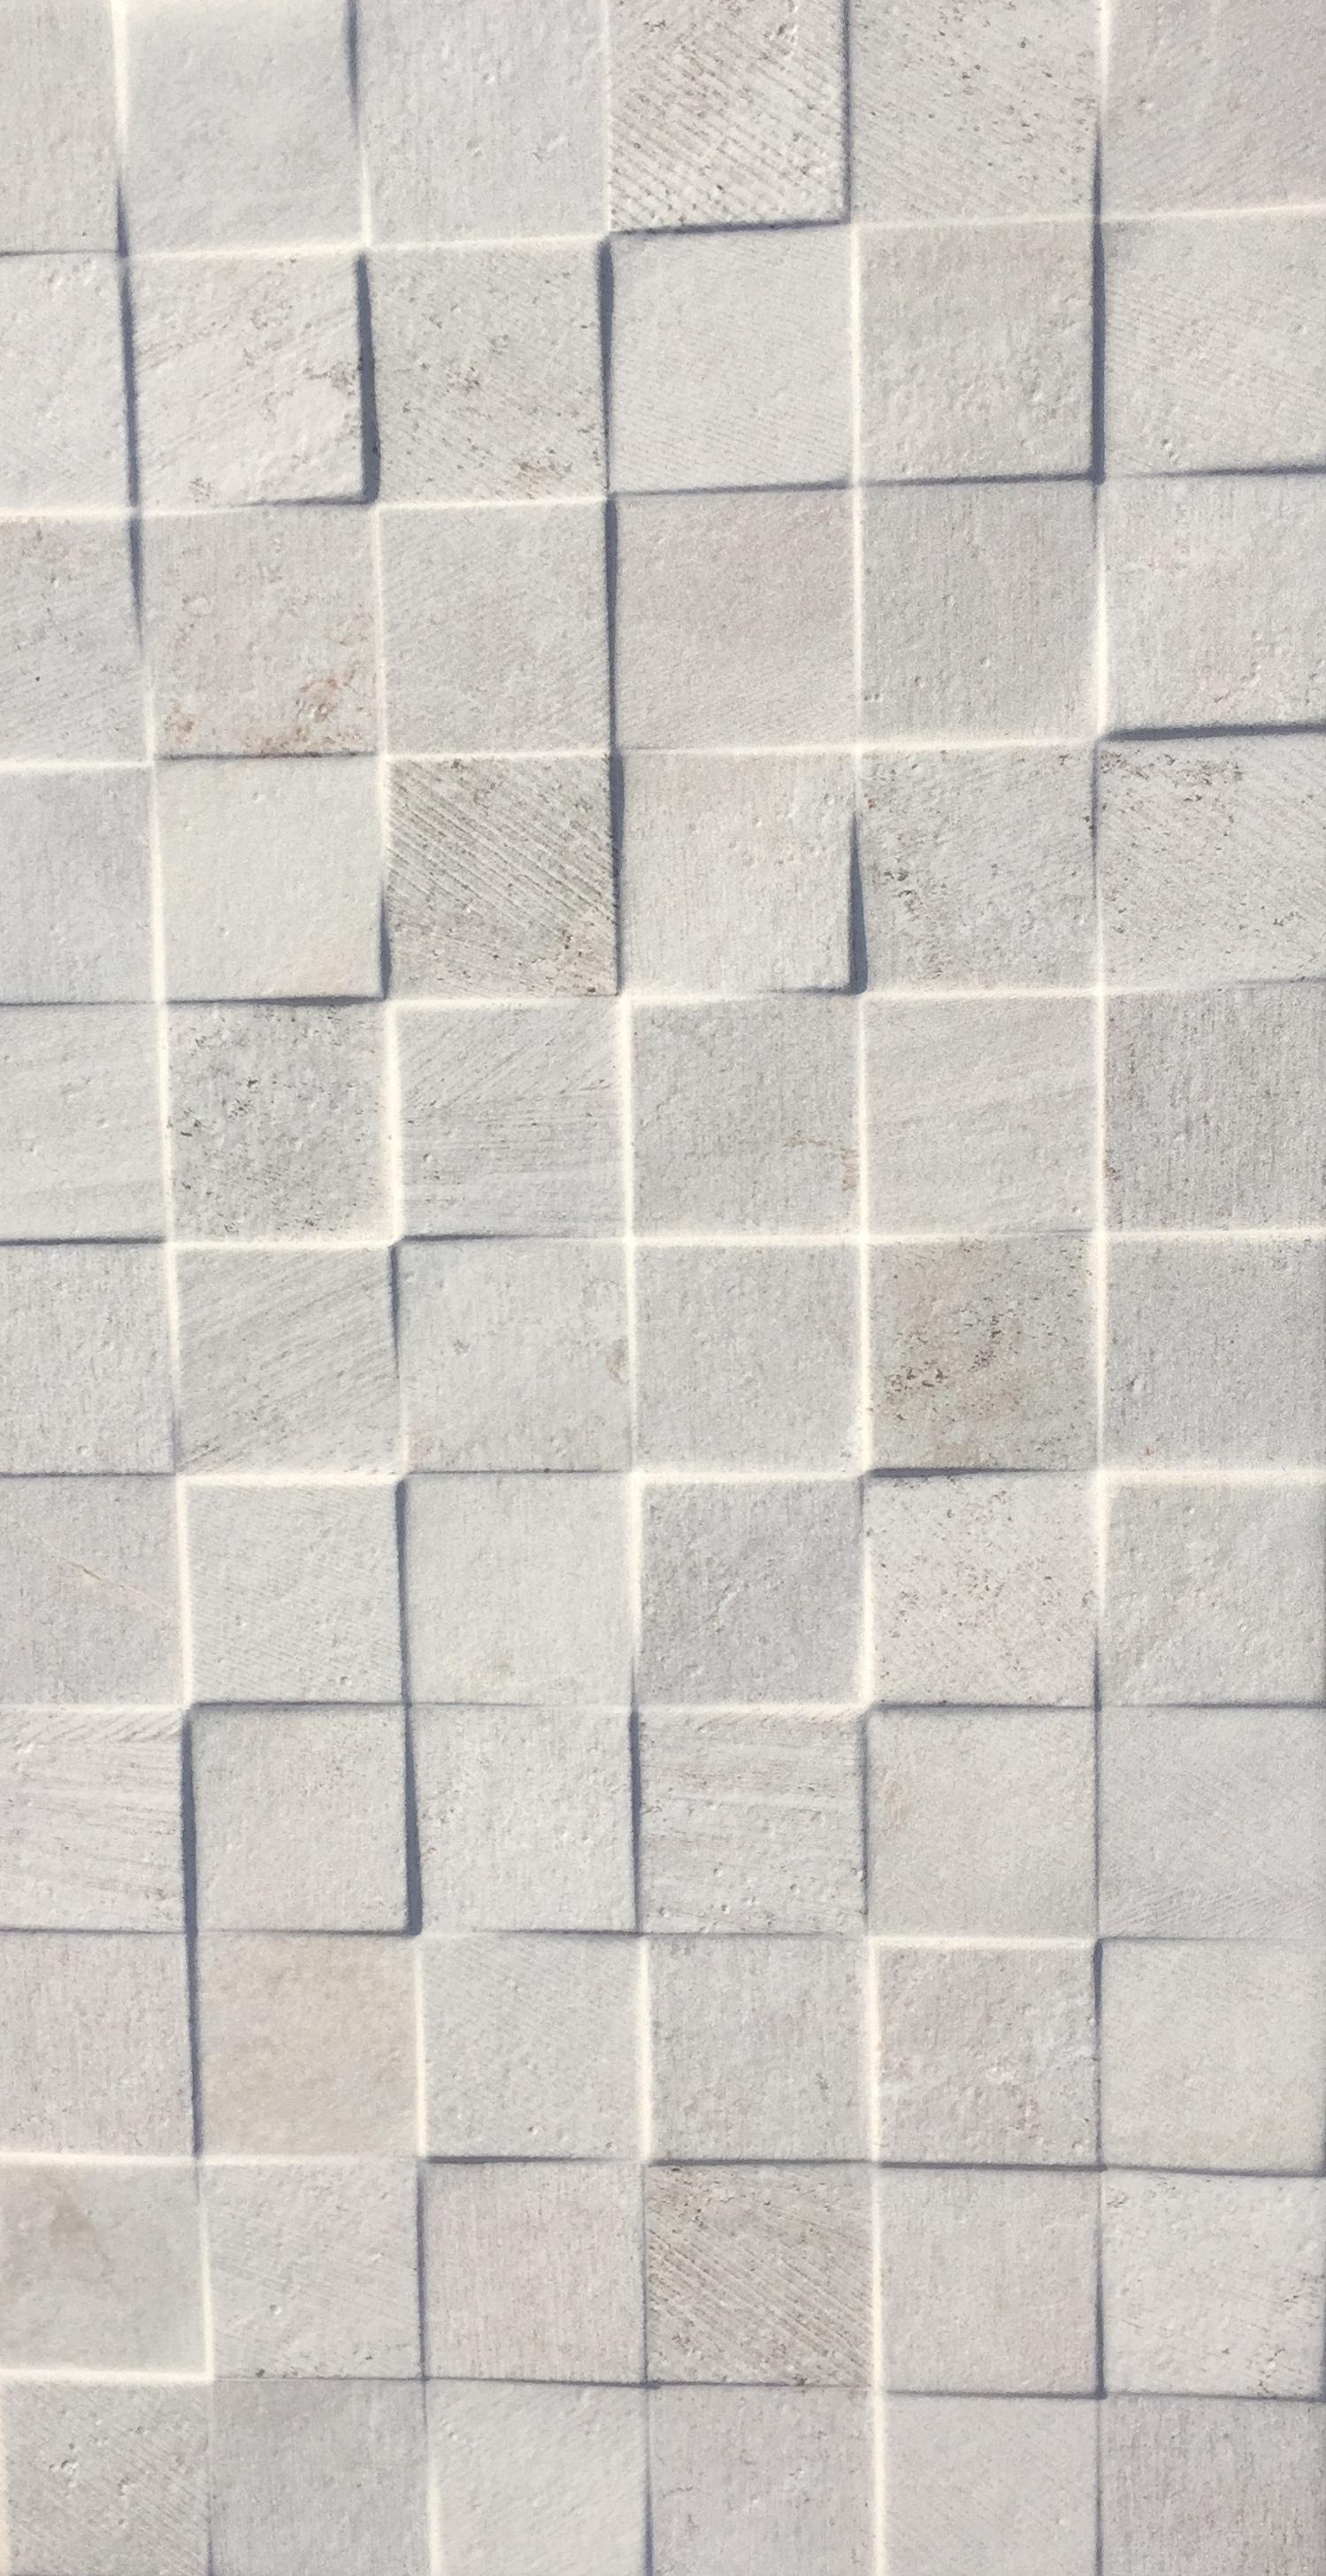 Mosaico Rodano Caliza 31 6x59 2 Tiles 2 Go Ltd